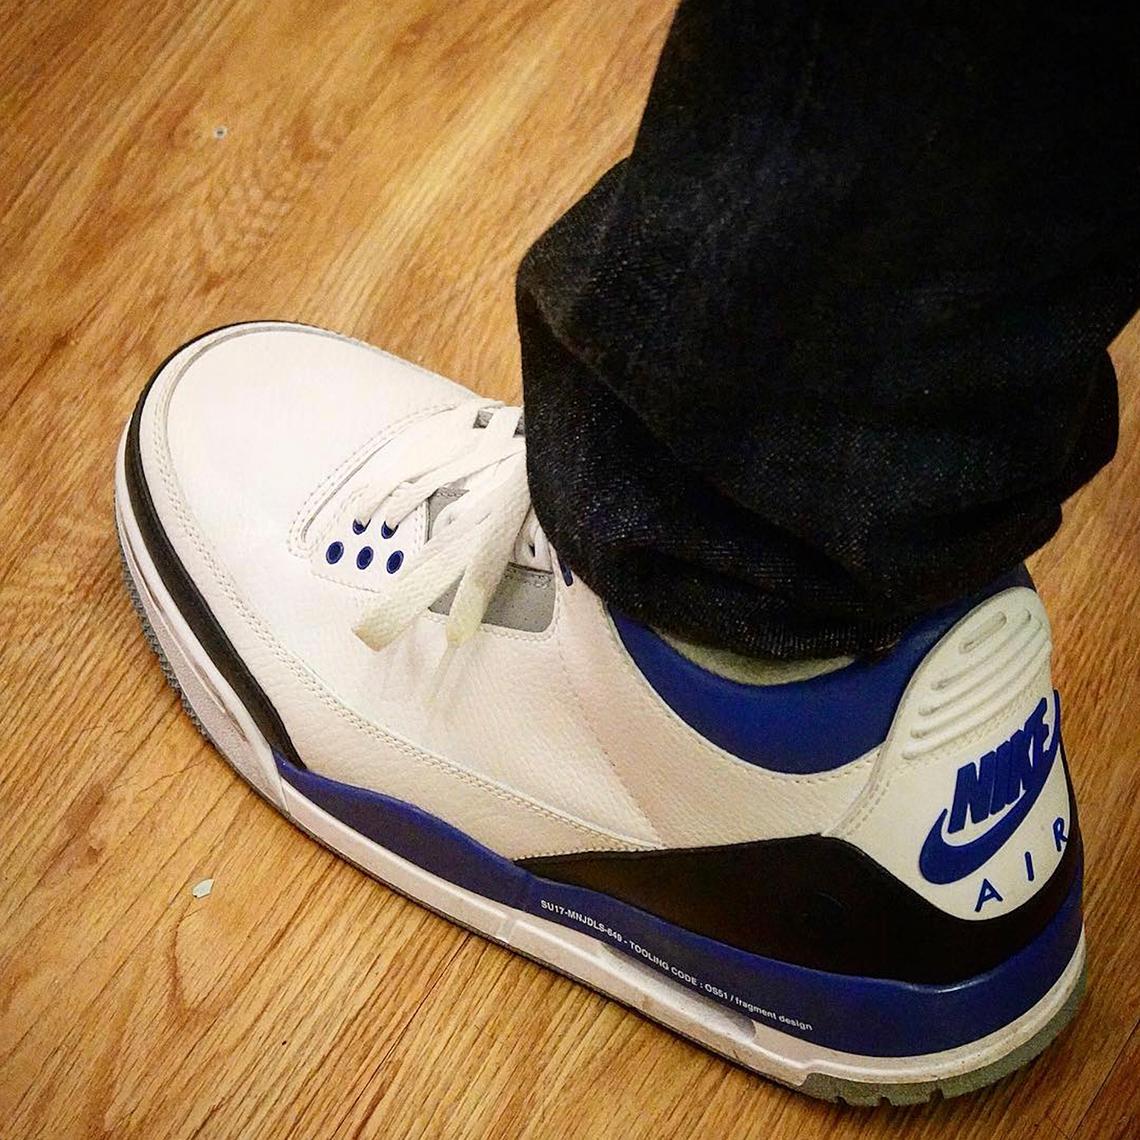 8f92cb192ae Fragment Design Air Jordan 3 Release Info | SneakerNews.com